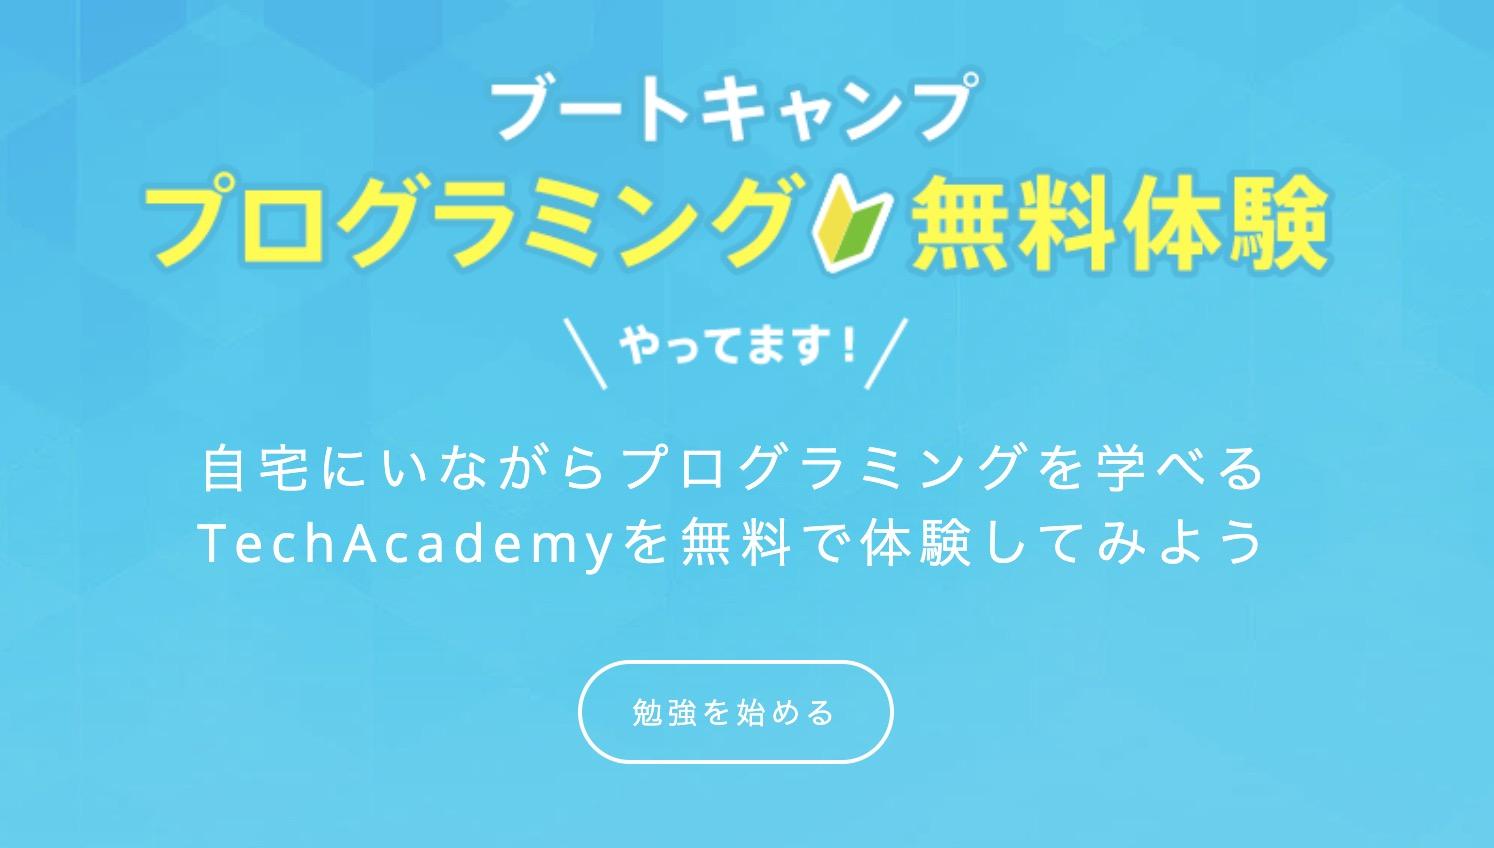 TechAcademy(テックアカデミー)の無料プログラミング体験の紹介